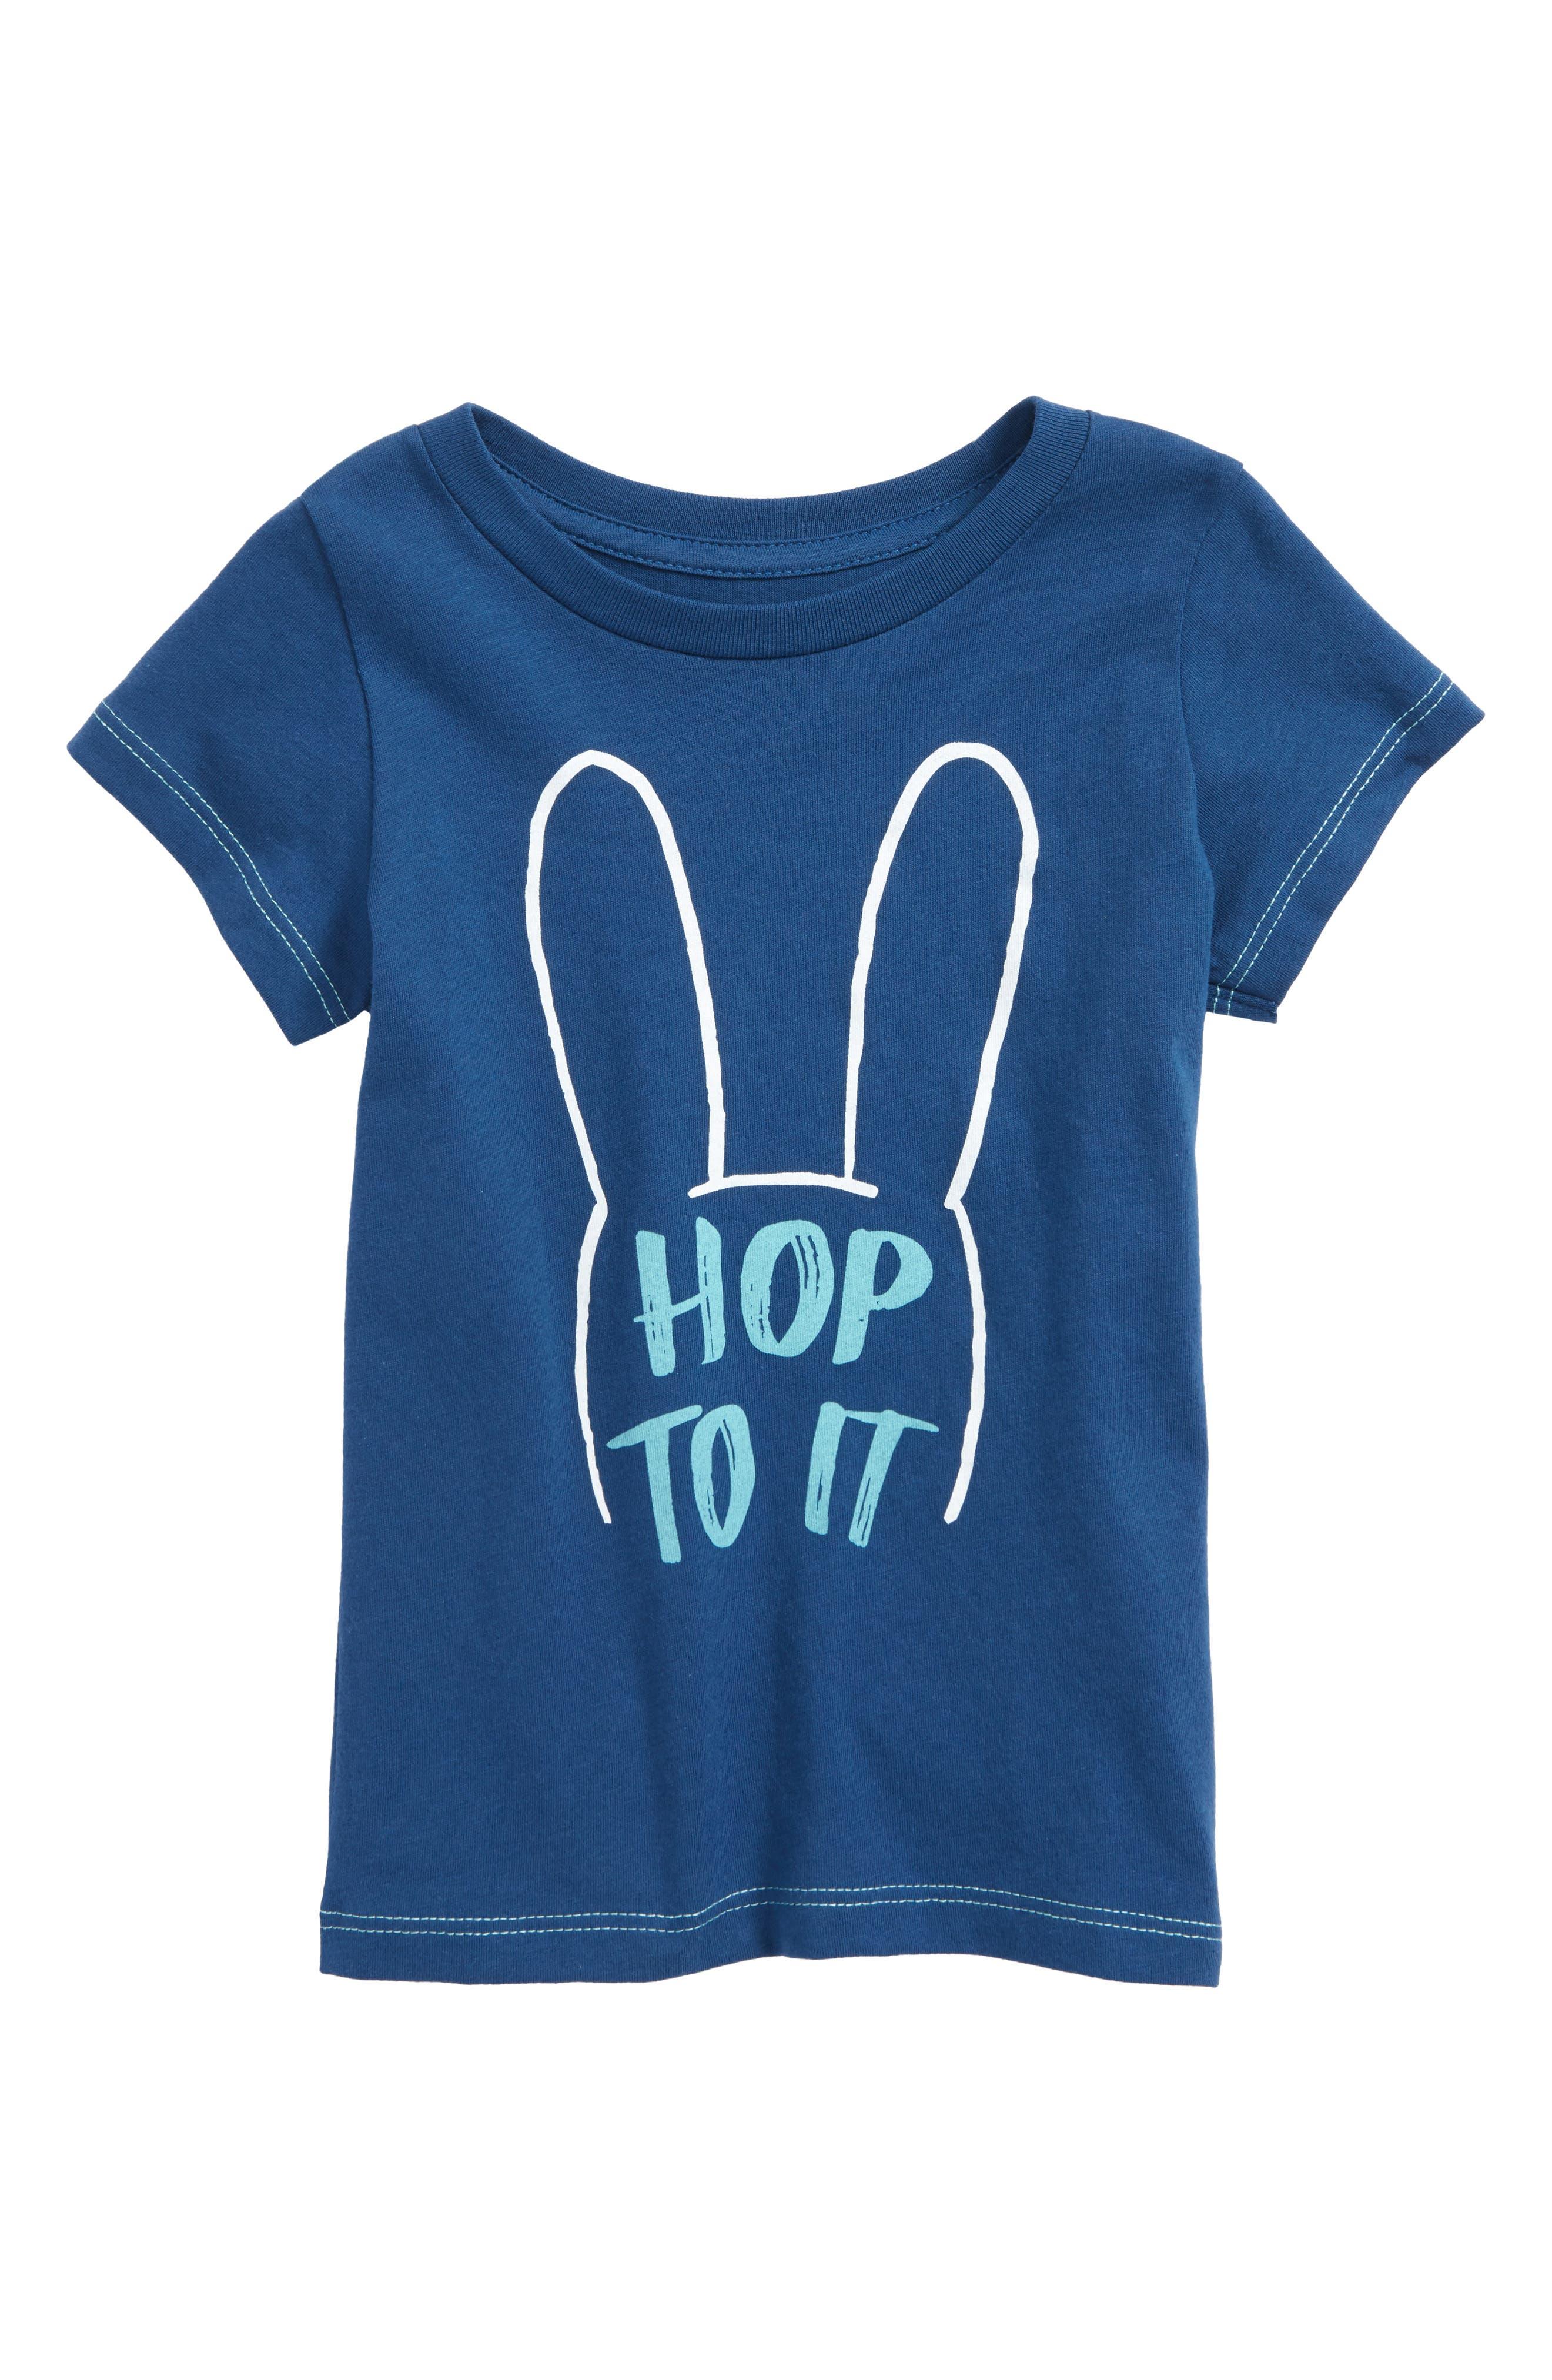 Peek Hop To It Graphic T-Shirt,                             Main thumbnail 1, color,                             440